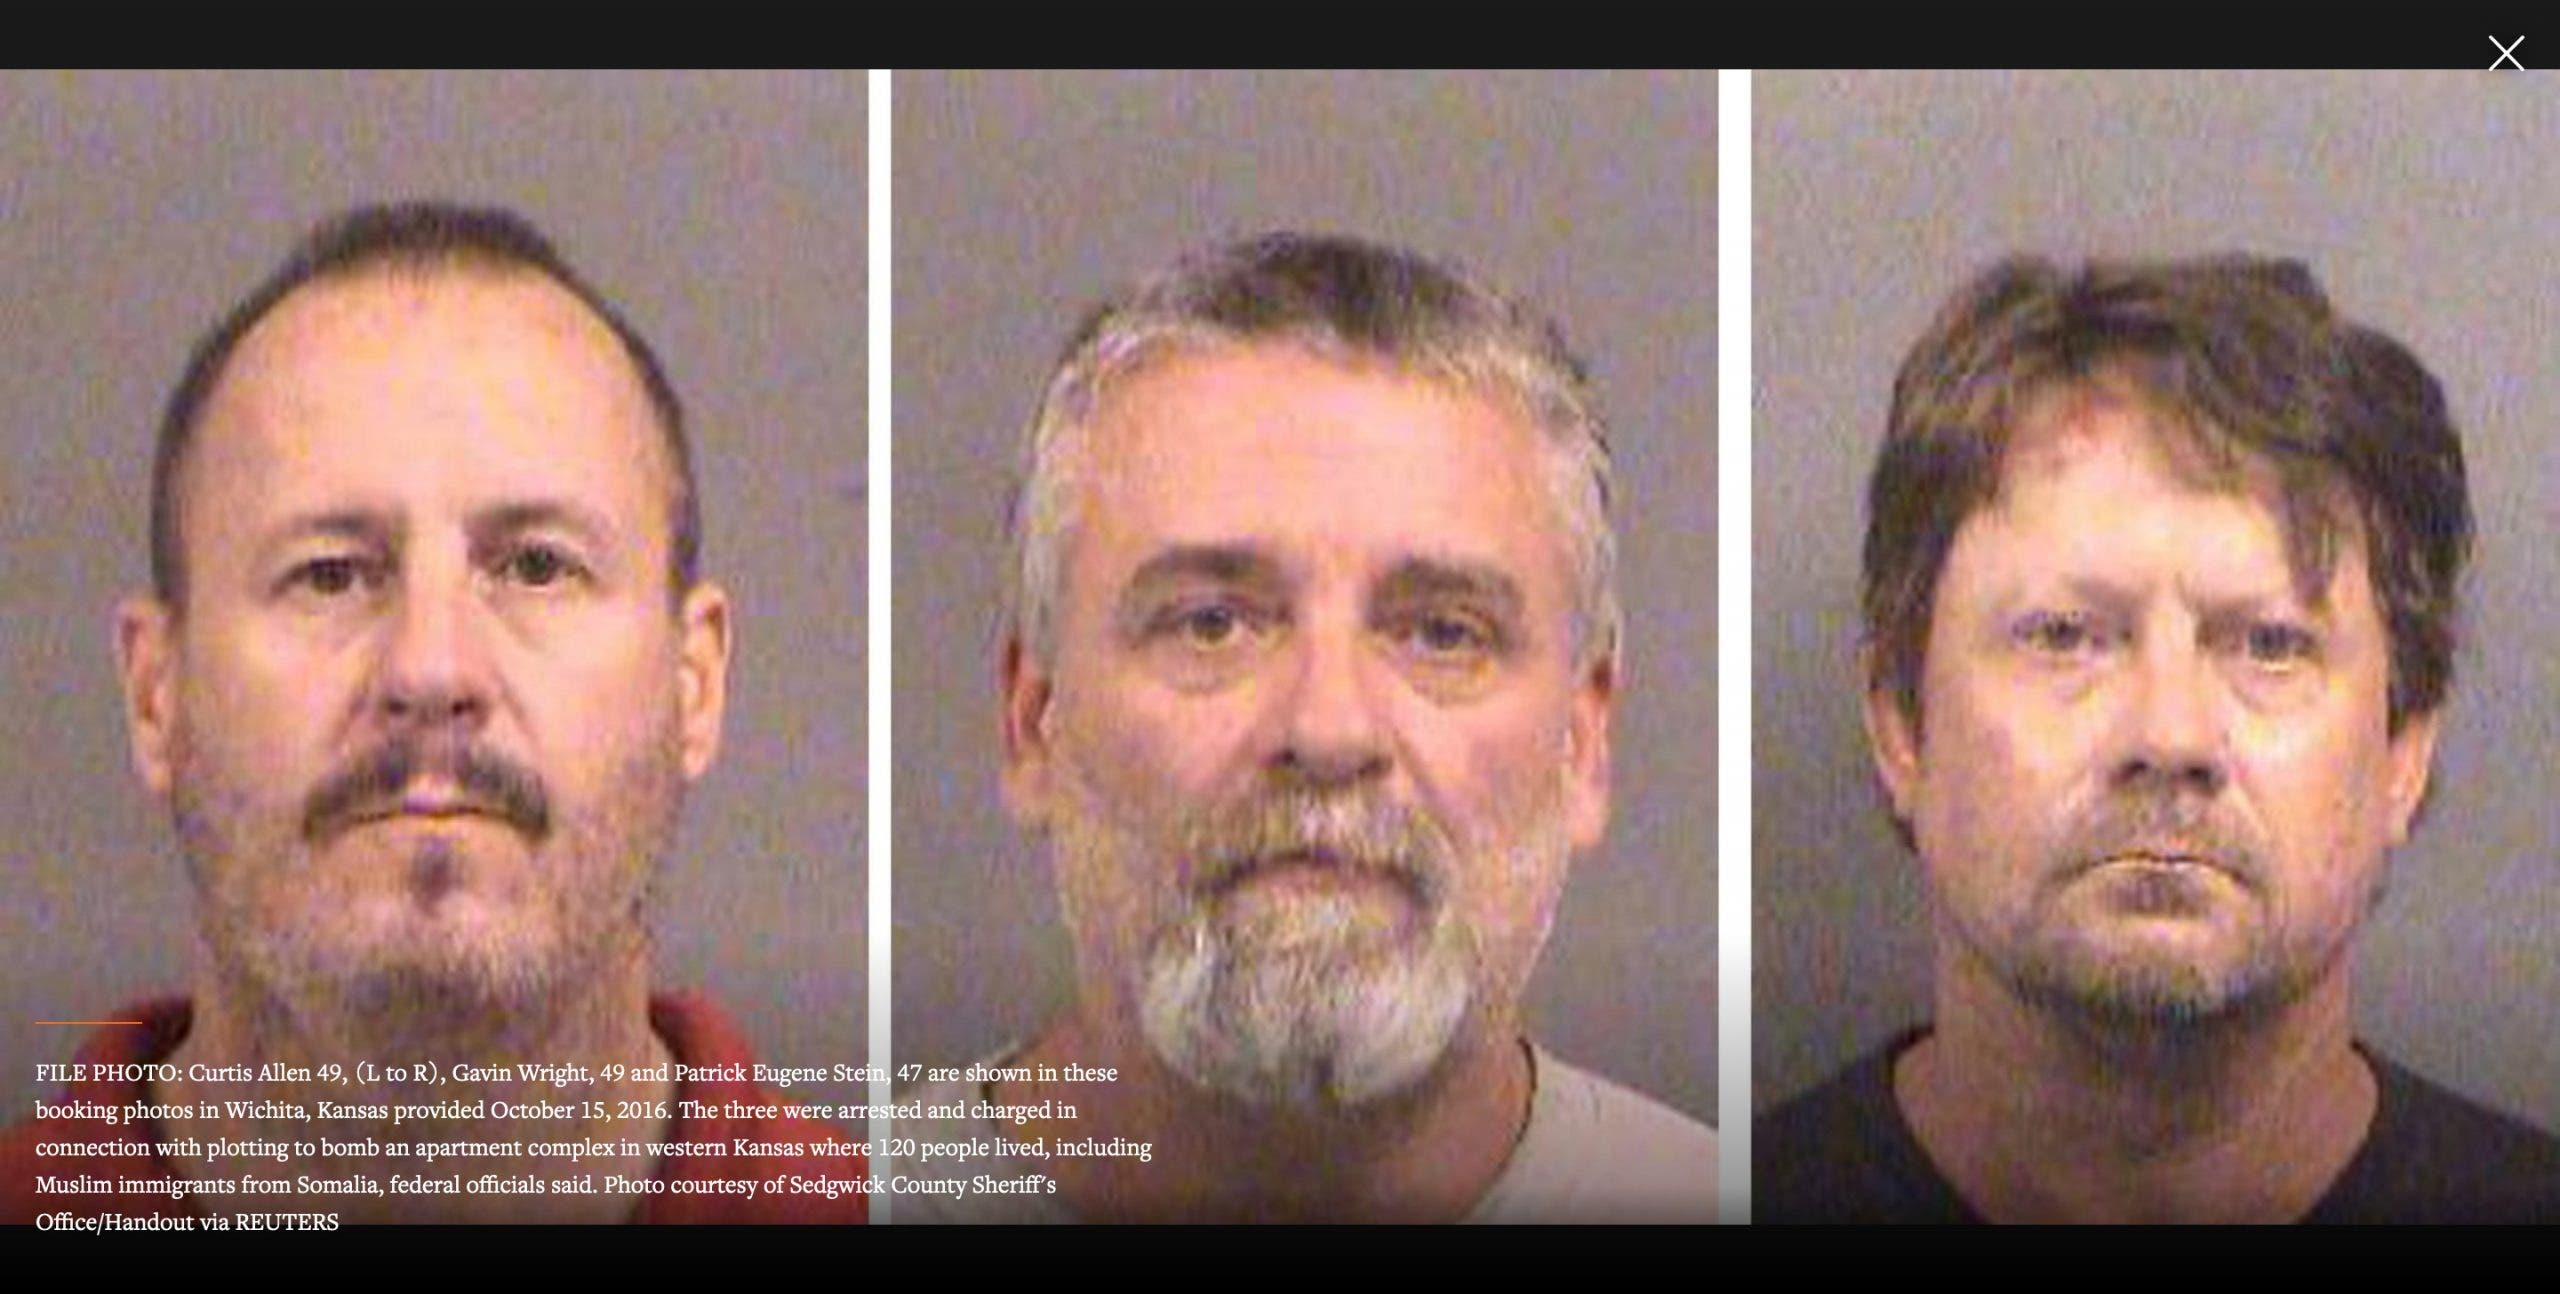 U.S. appeals court upholds prison sentences for men who plotted to bomb Kansas Somalis